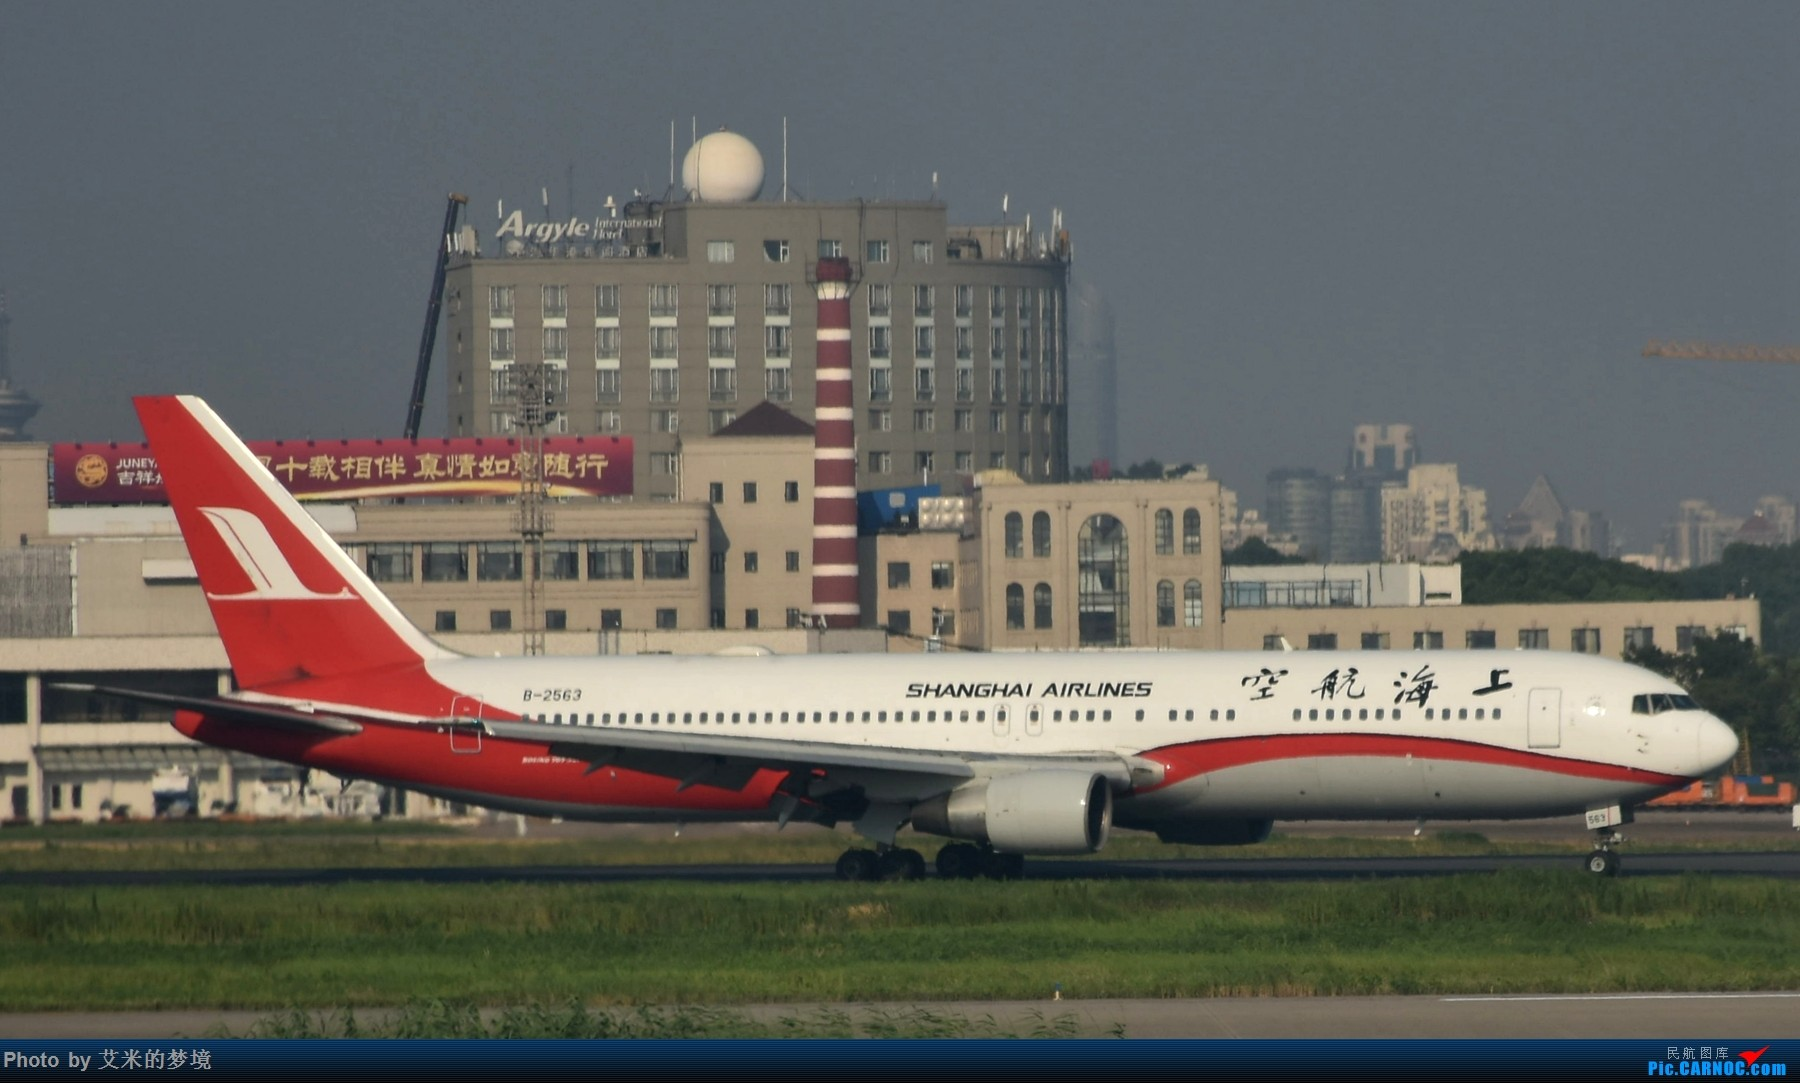 Re:[原创]【carnoc重庆飞友会】北京送行,所见飞行 BOEING 767-300 B-2563 中国上海虹桥国际机场